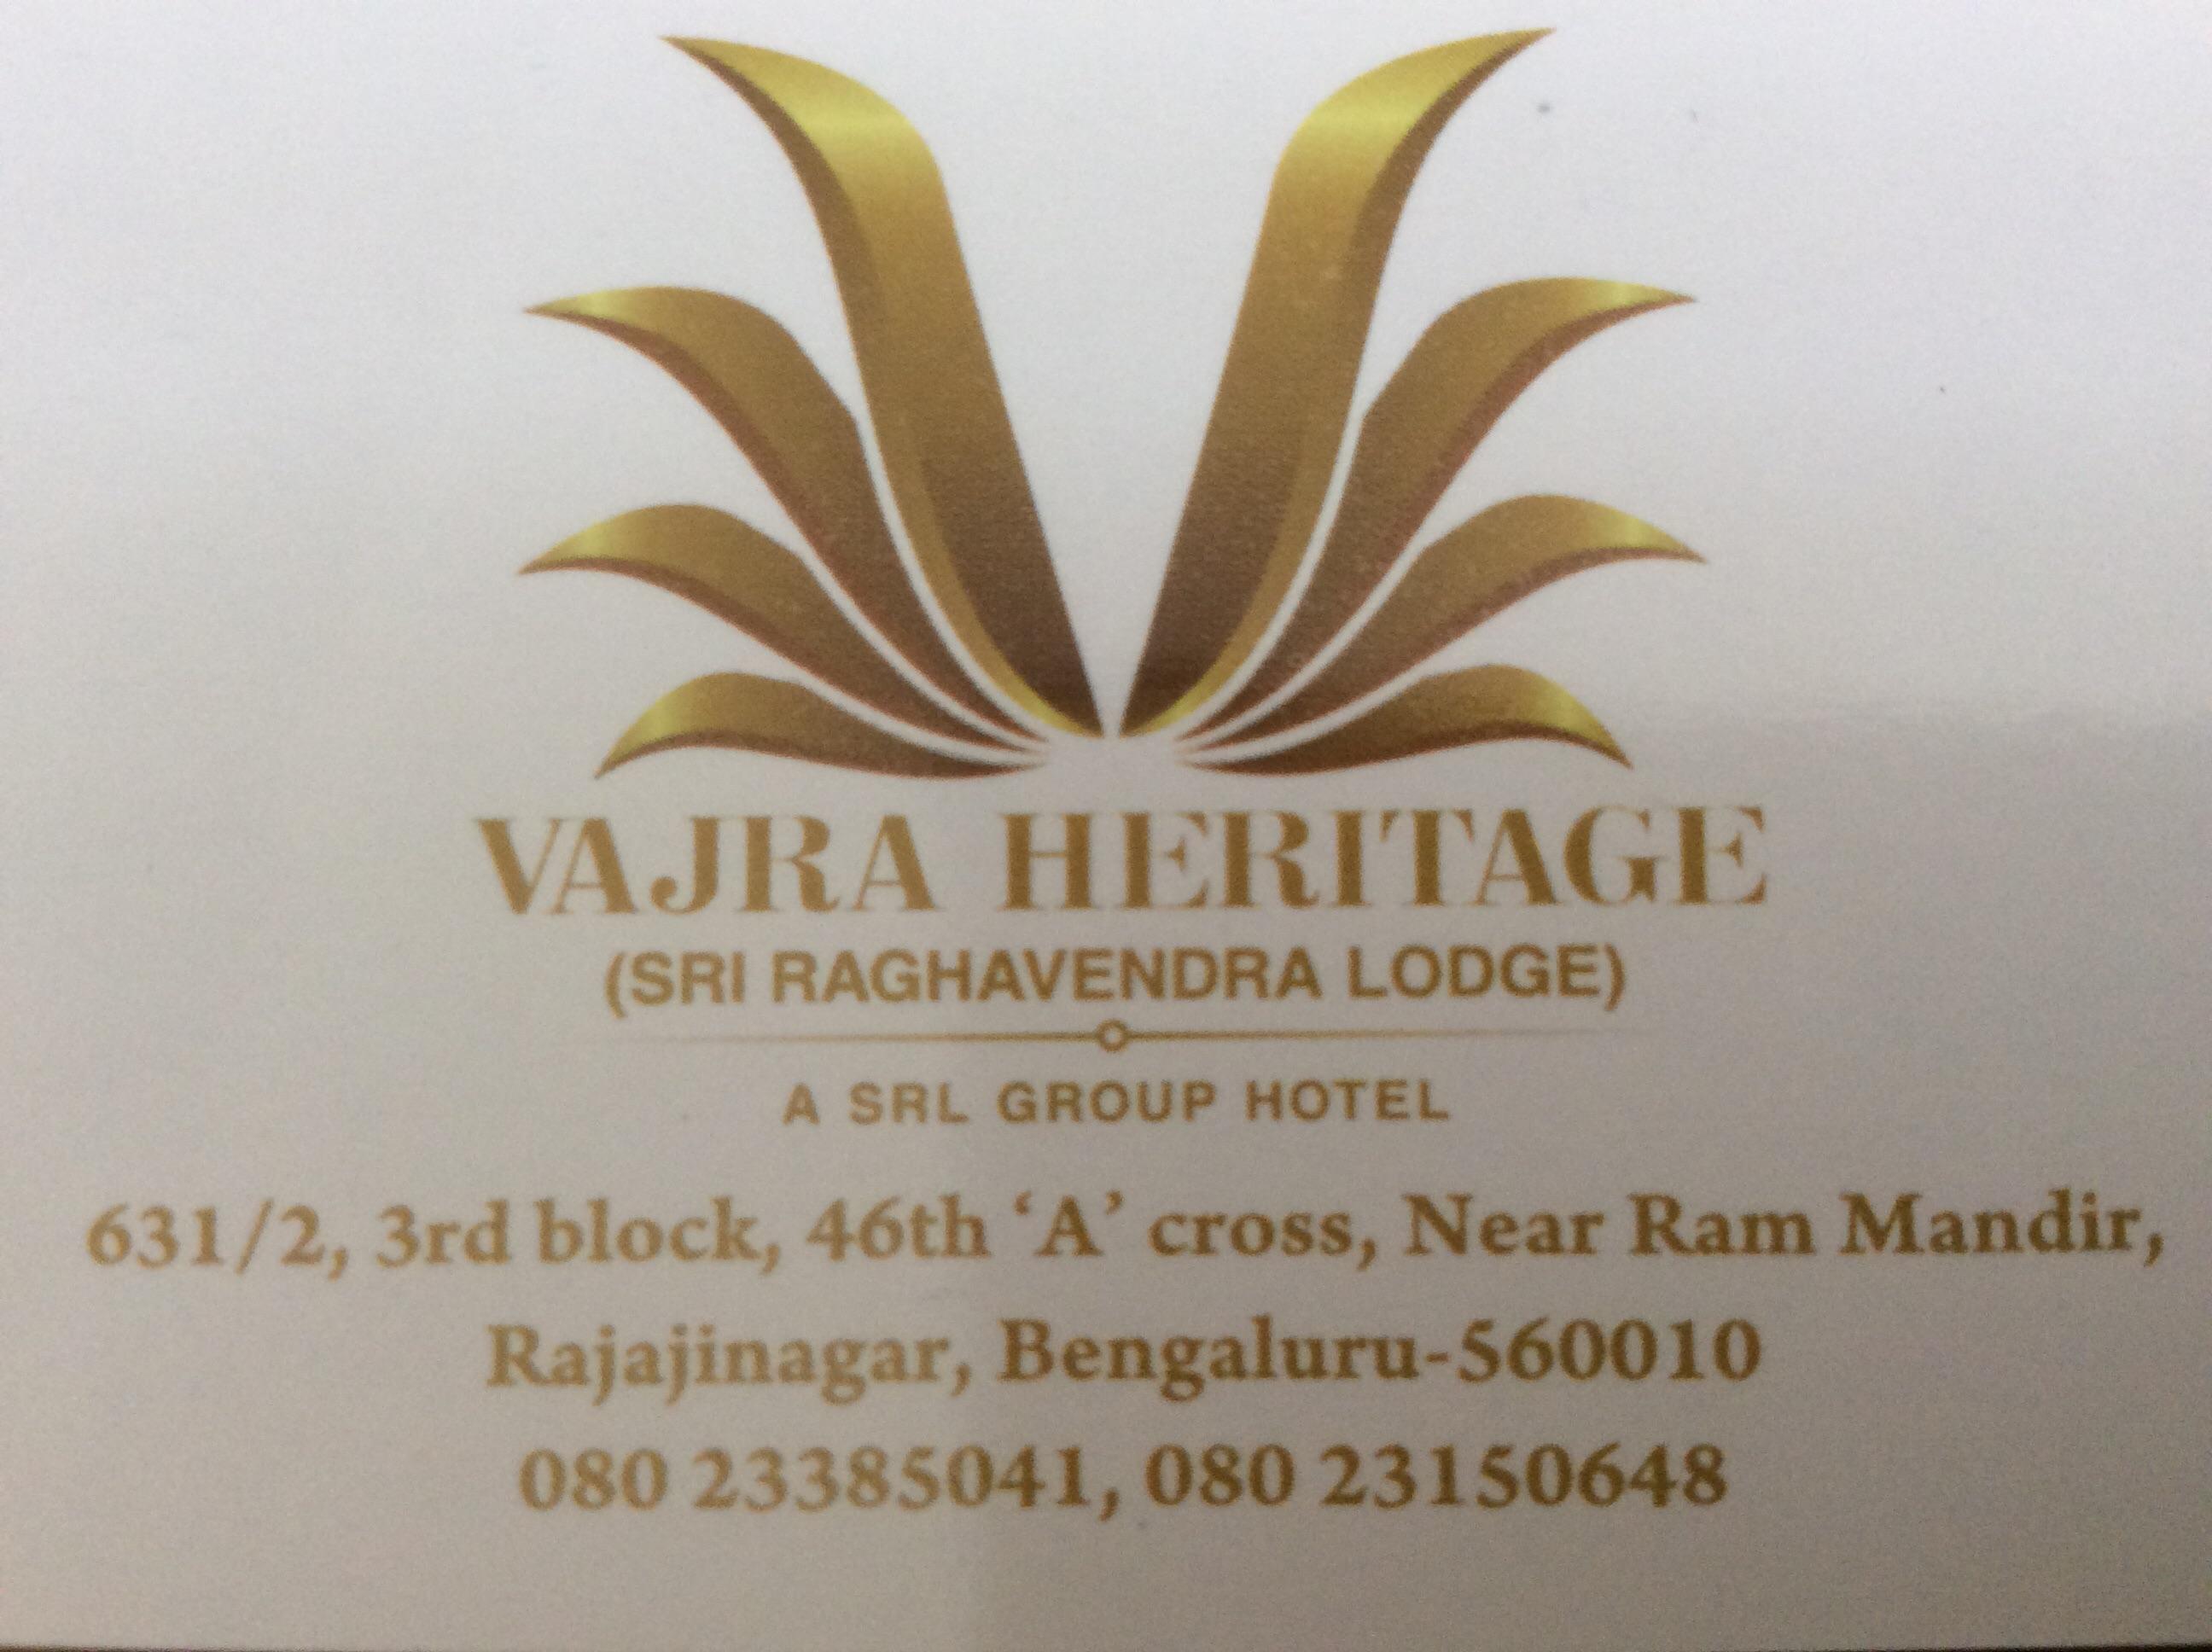 VAJRA HERITAGE - logo